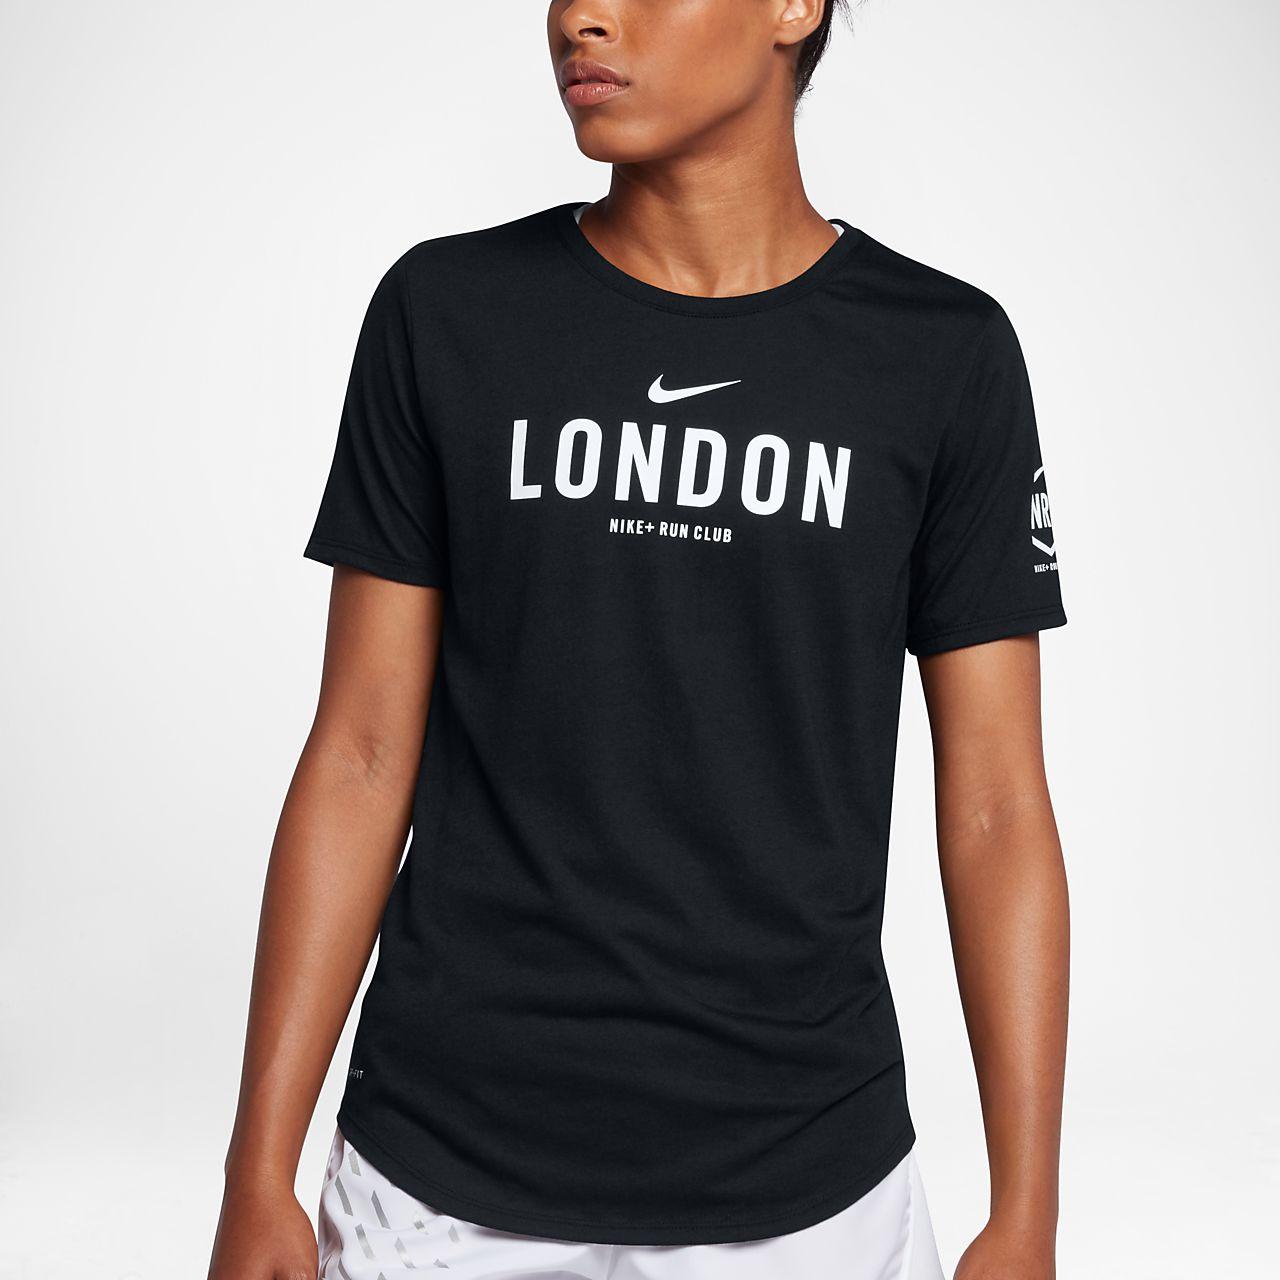 Nike dri fit run club london women 39 s t shirt pt for Nike dri fit t shirt ladies